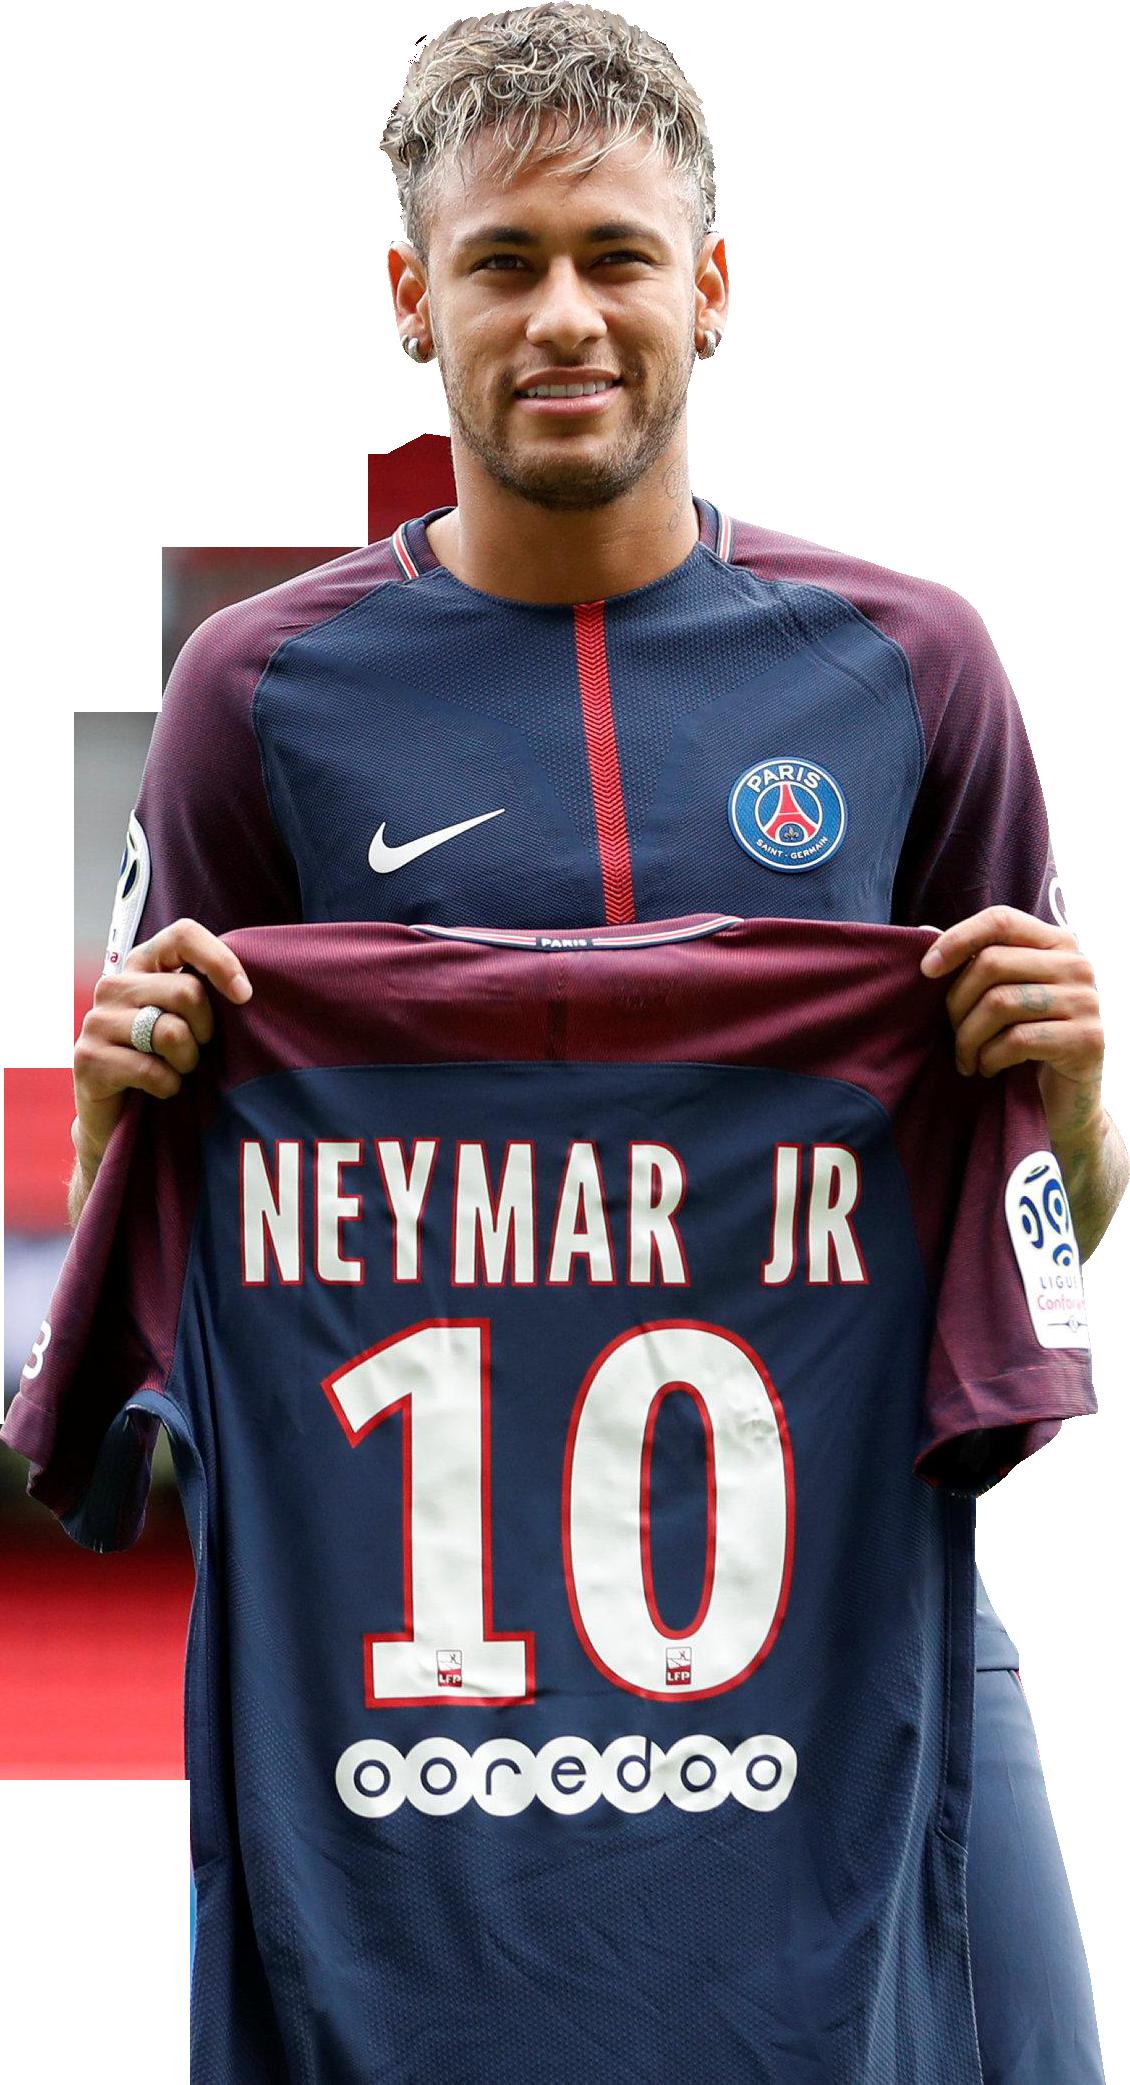 Neymar PSG 2017 Jr Official